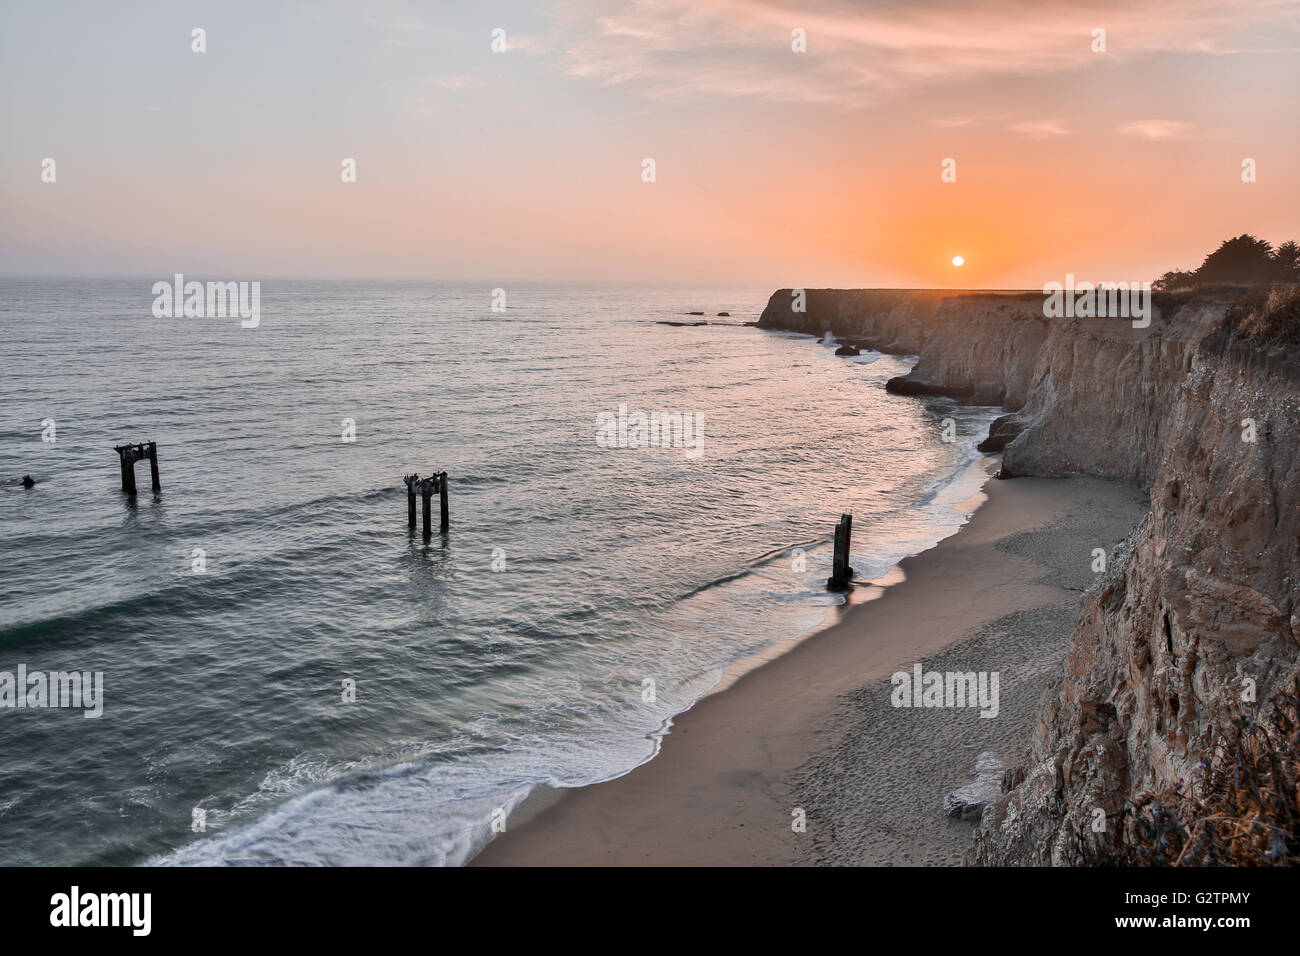 Sunset over Davenport Pier Beach - Stock Image